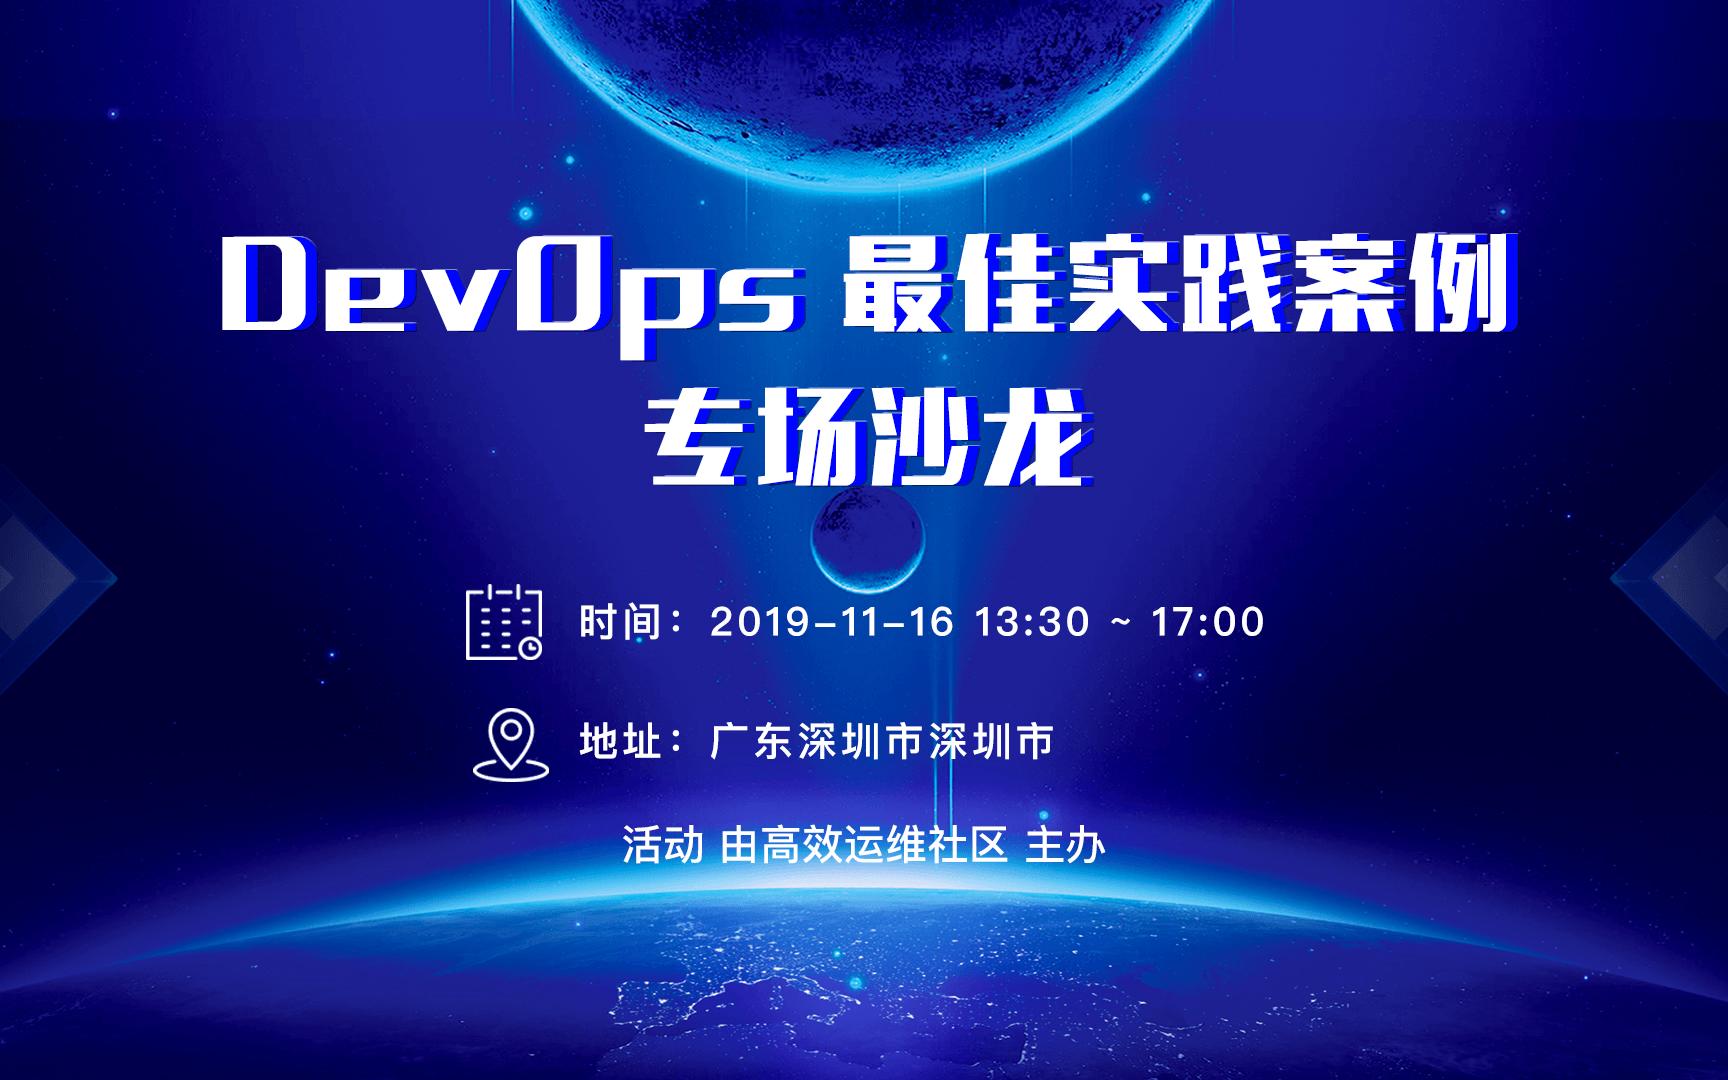 2019 DevOps最佳实践案例专场沙龙(深圳)